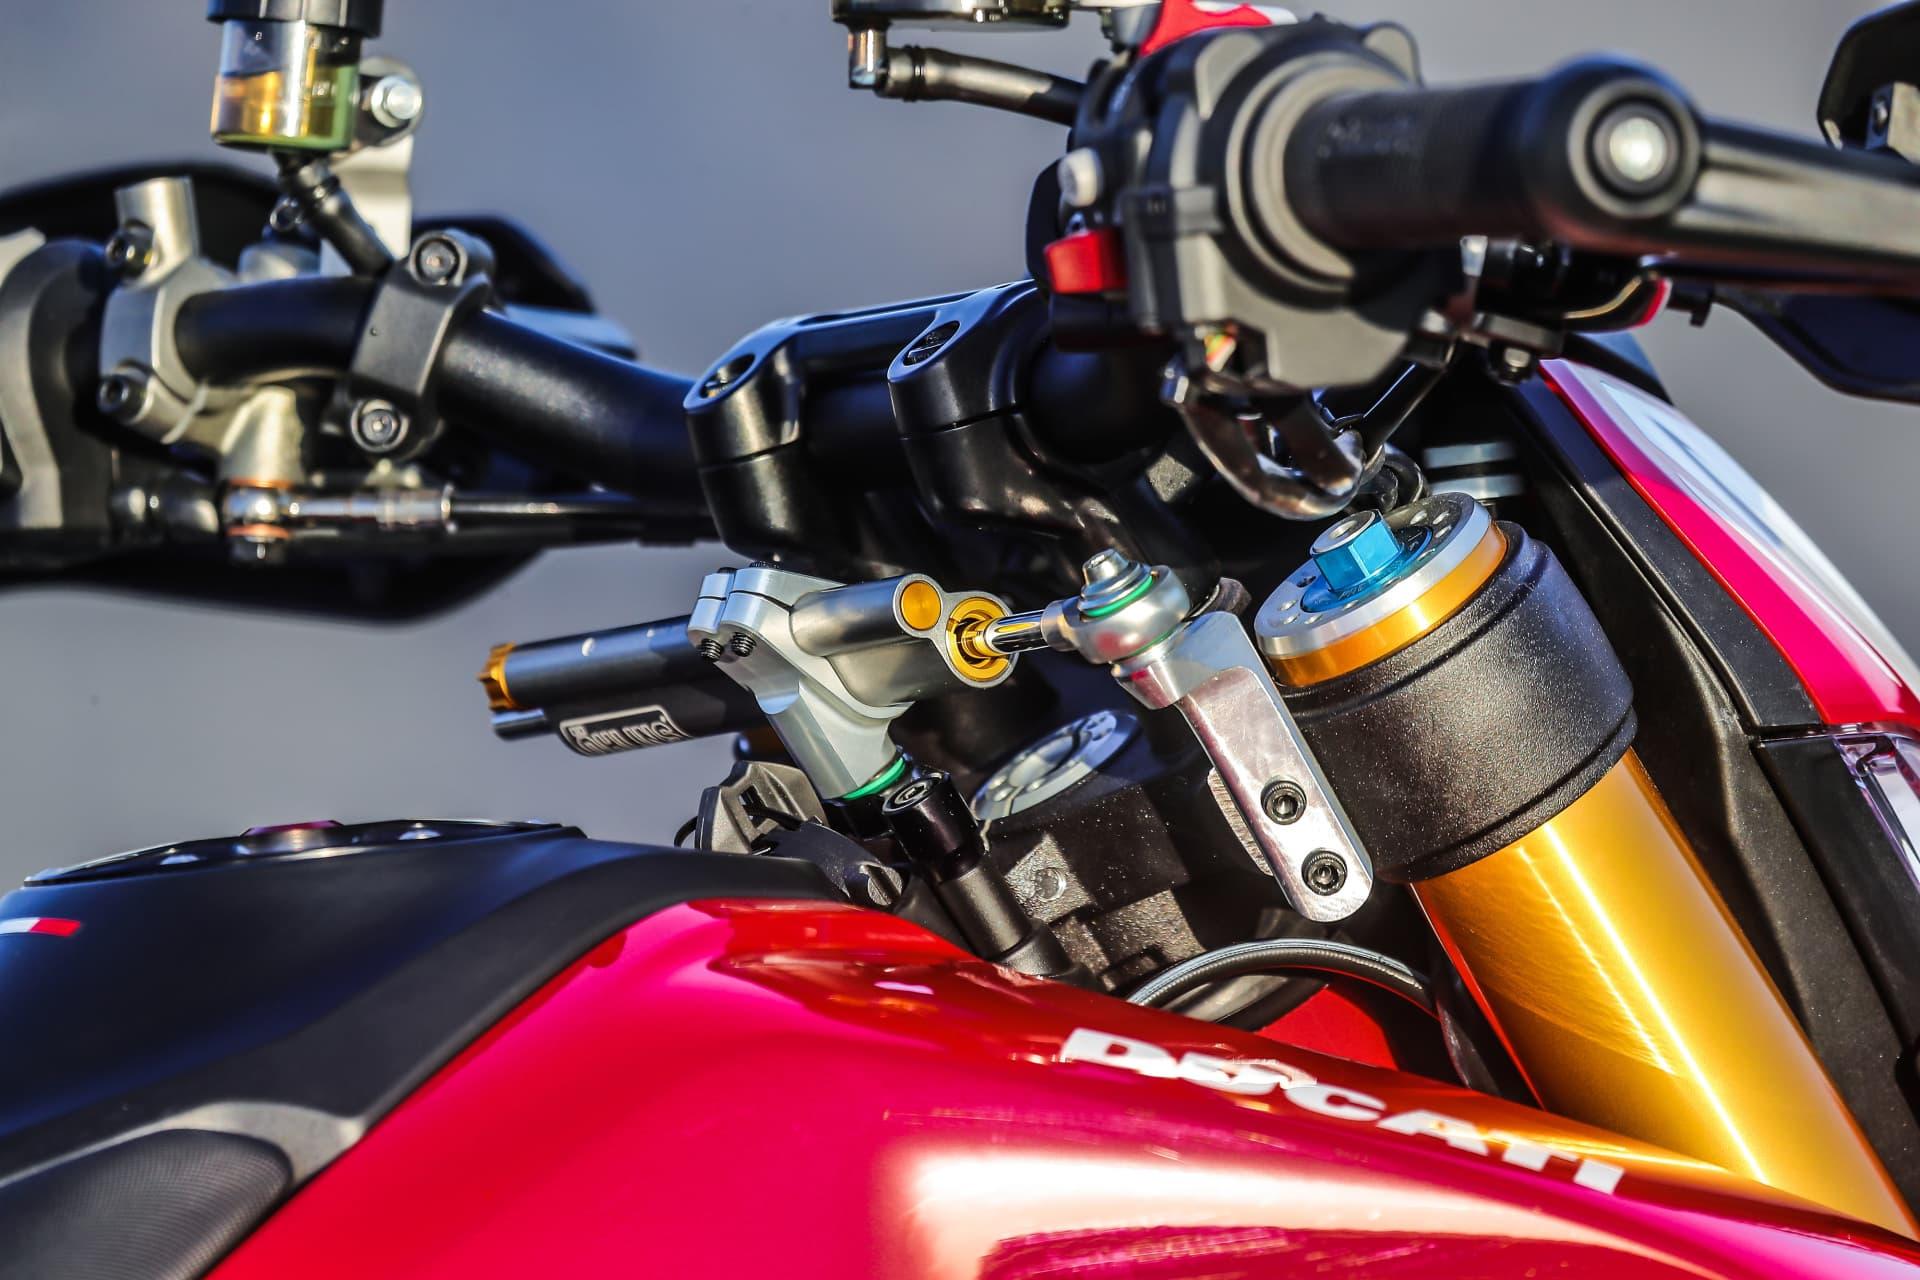 Ducati Hypermotard 950 Sp Static 35 Uc70296 Mid